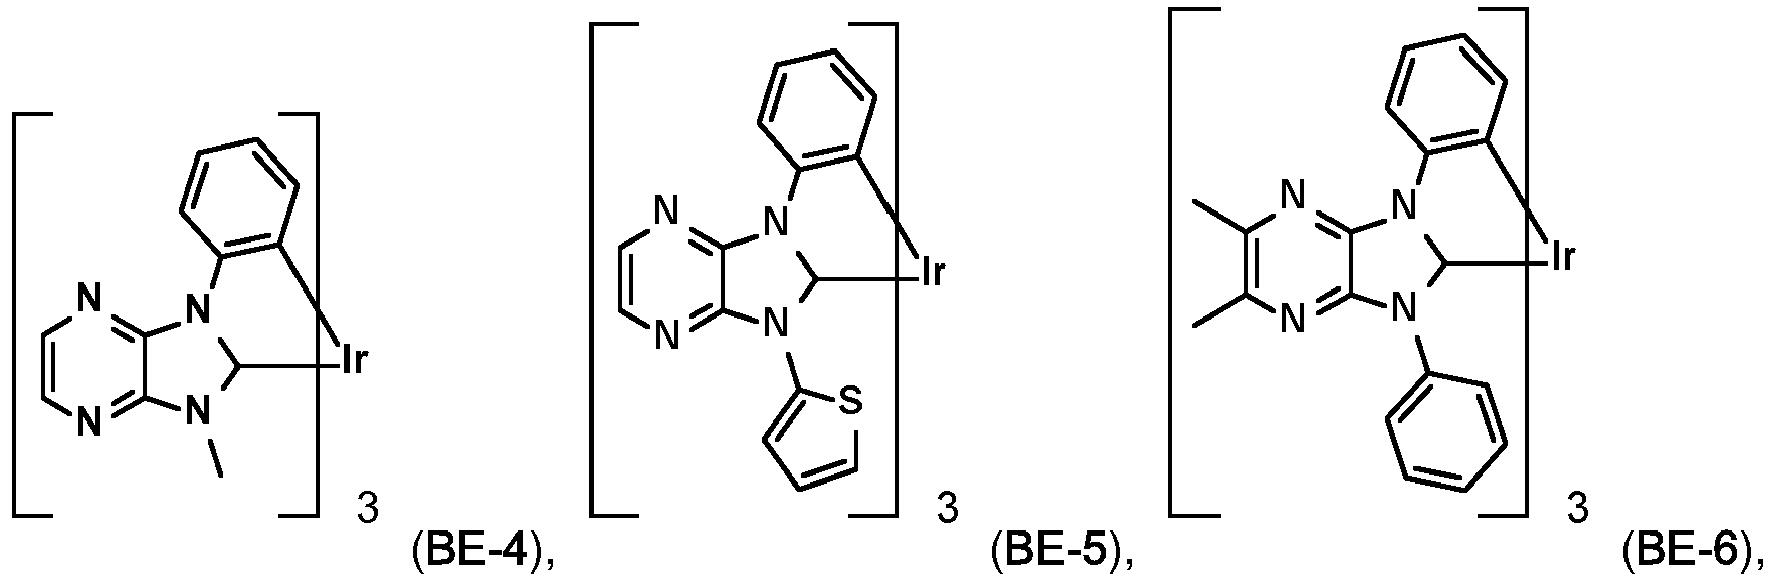 Figure imgb0753